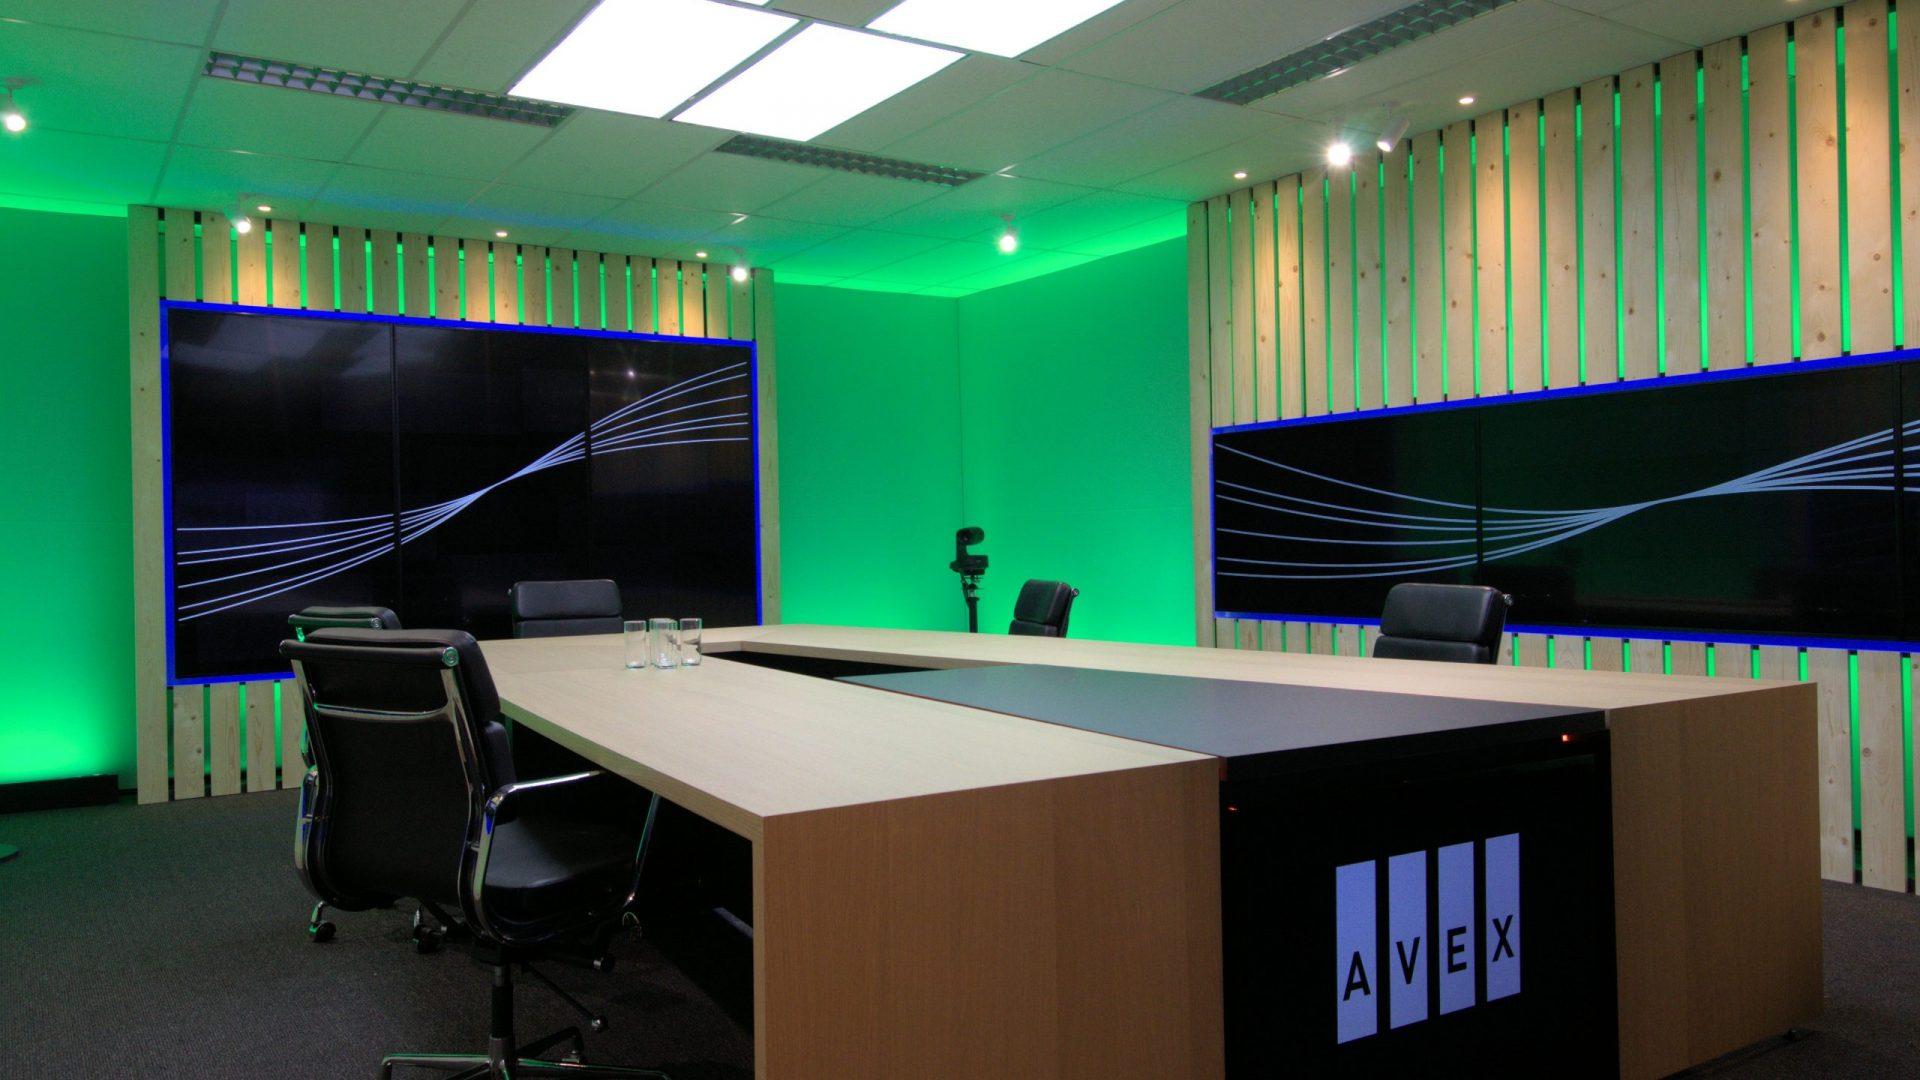 AVEX STUDIOS juli 2020 (7)